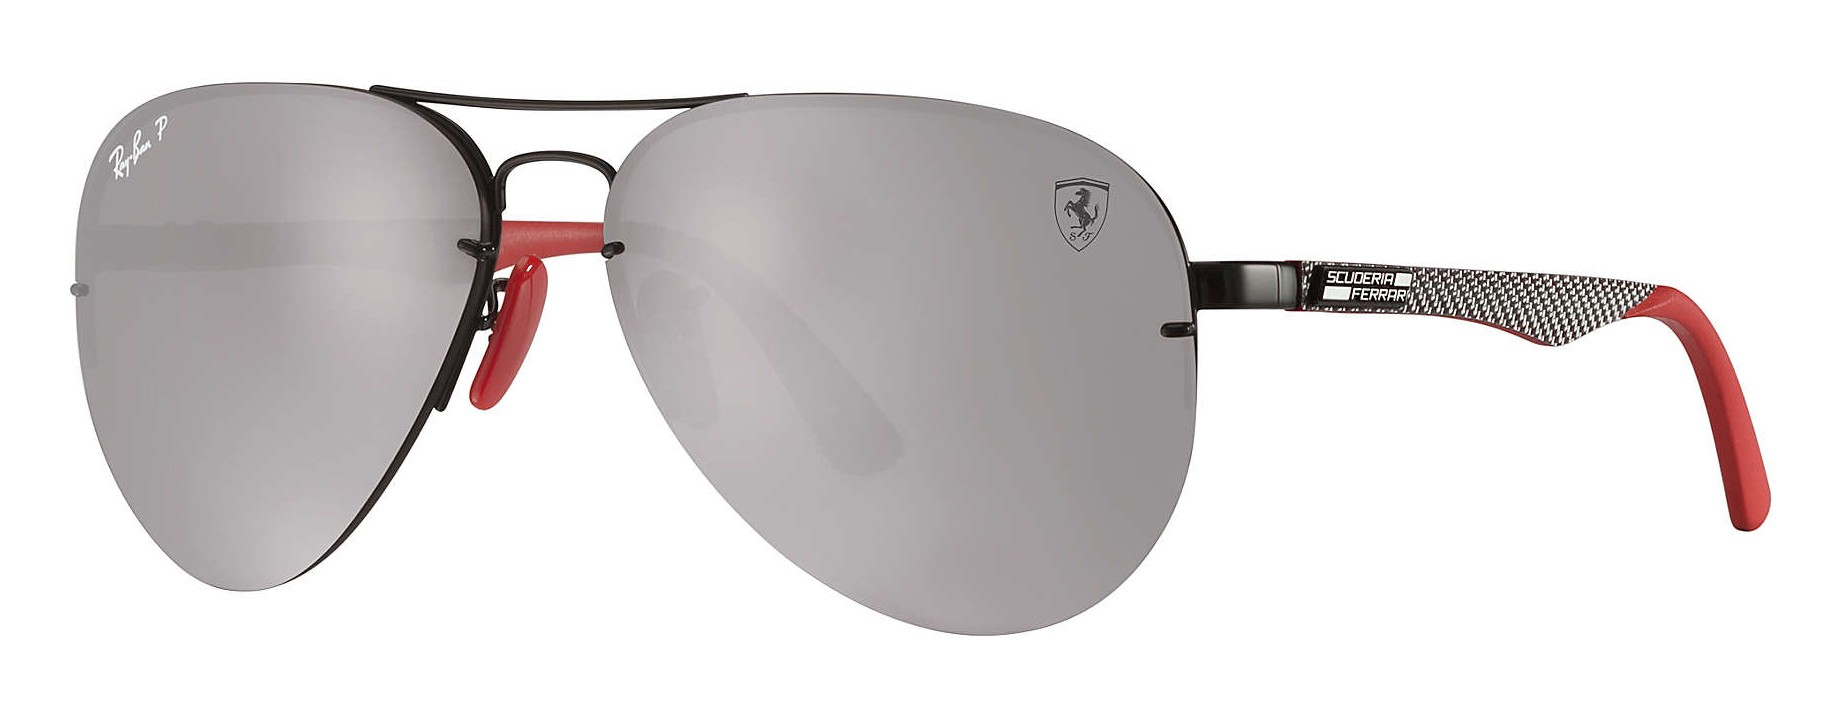 98722655f5a75 Ray-Ban - RB3460M F009H2 - Scuderia Ferrari Collection Aviator - Black  Silver Red - Silver Mirror - Sunglass - Eyewear